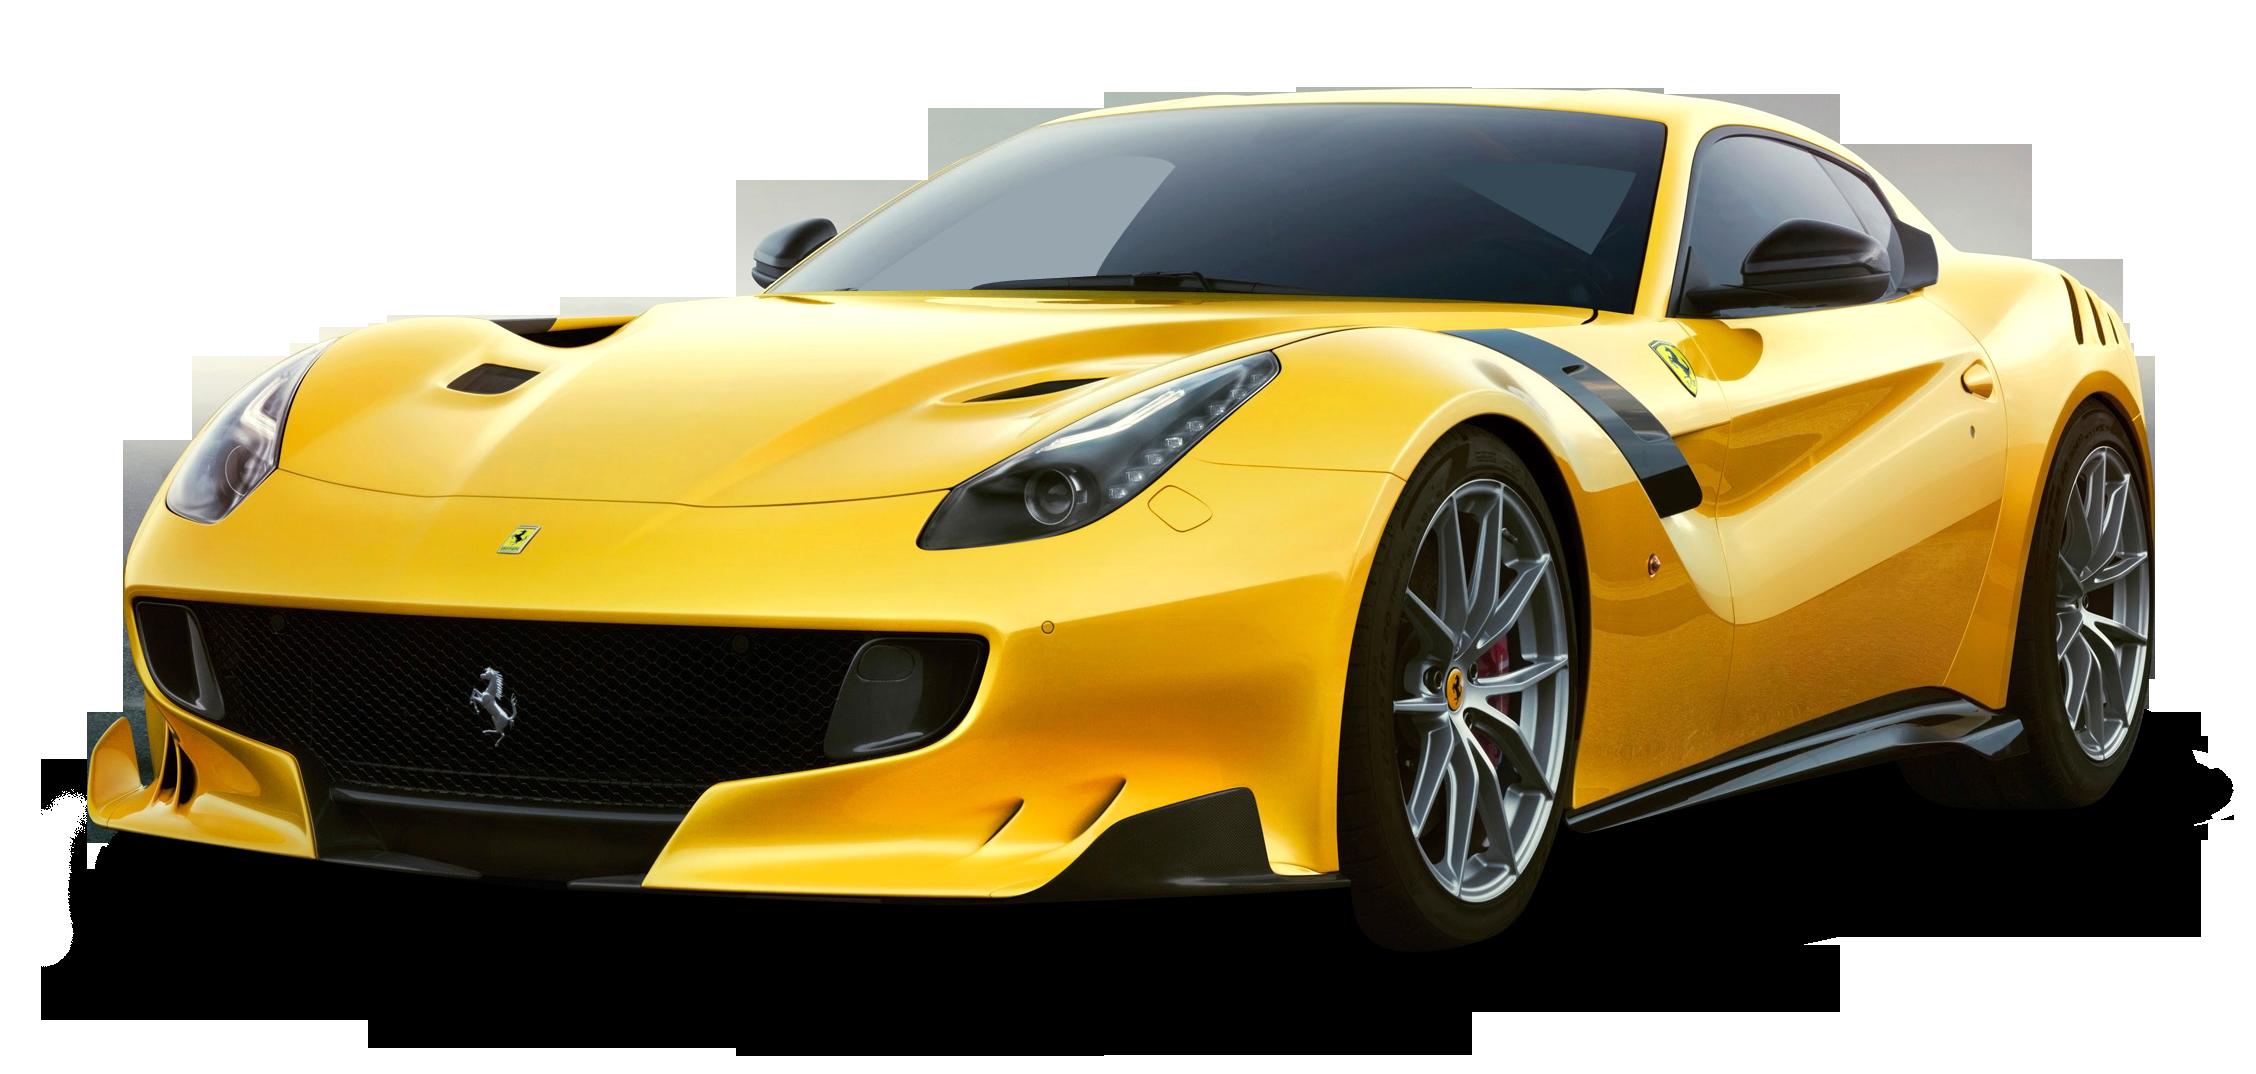 Yellow Ferrari F12tdf Car Png Image Purepng Free Transparent Cc0 Png Image Library